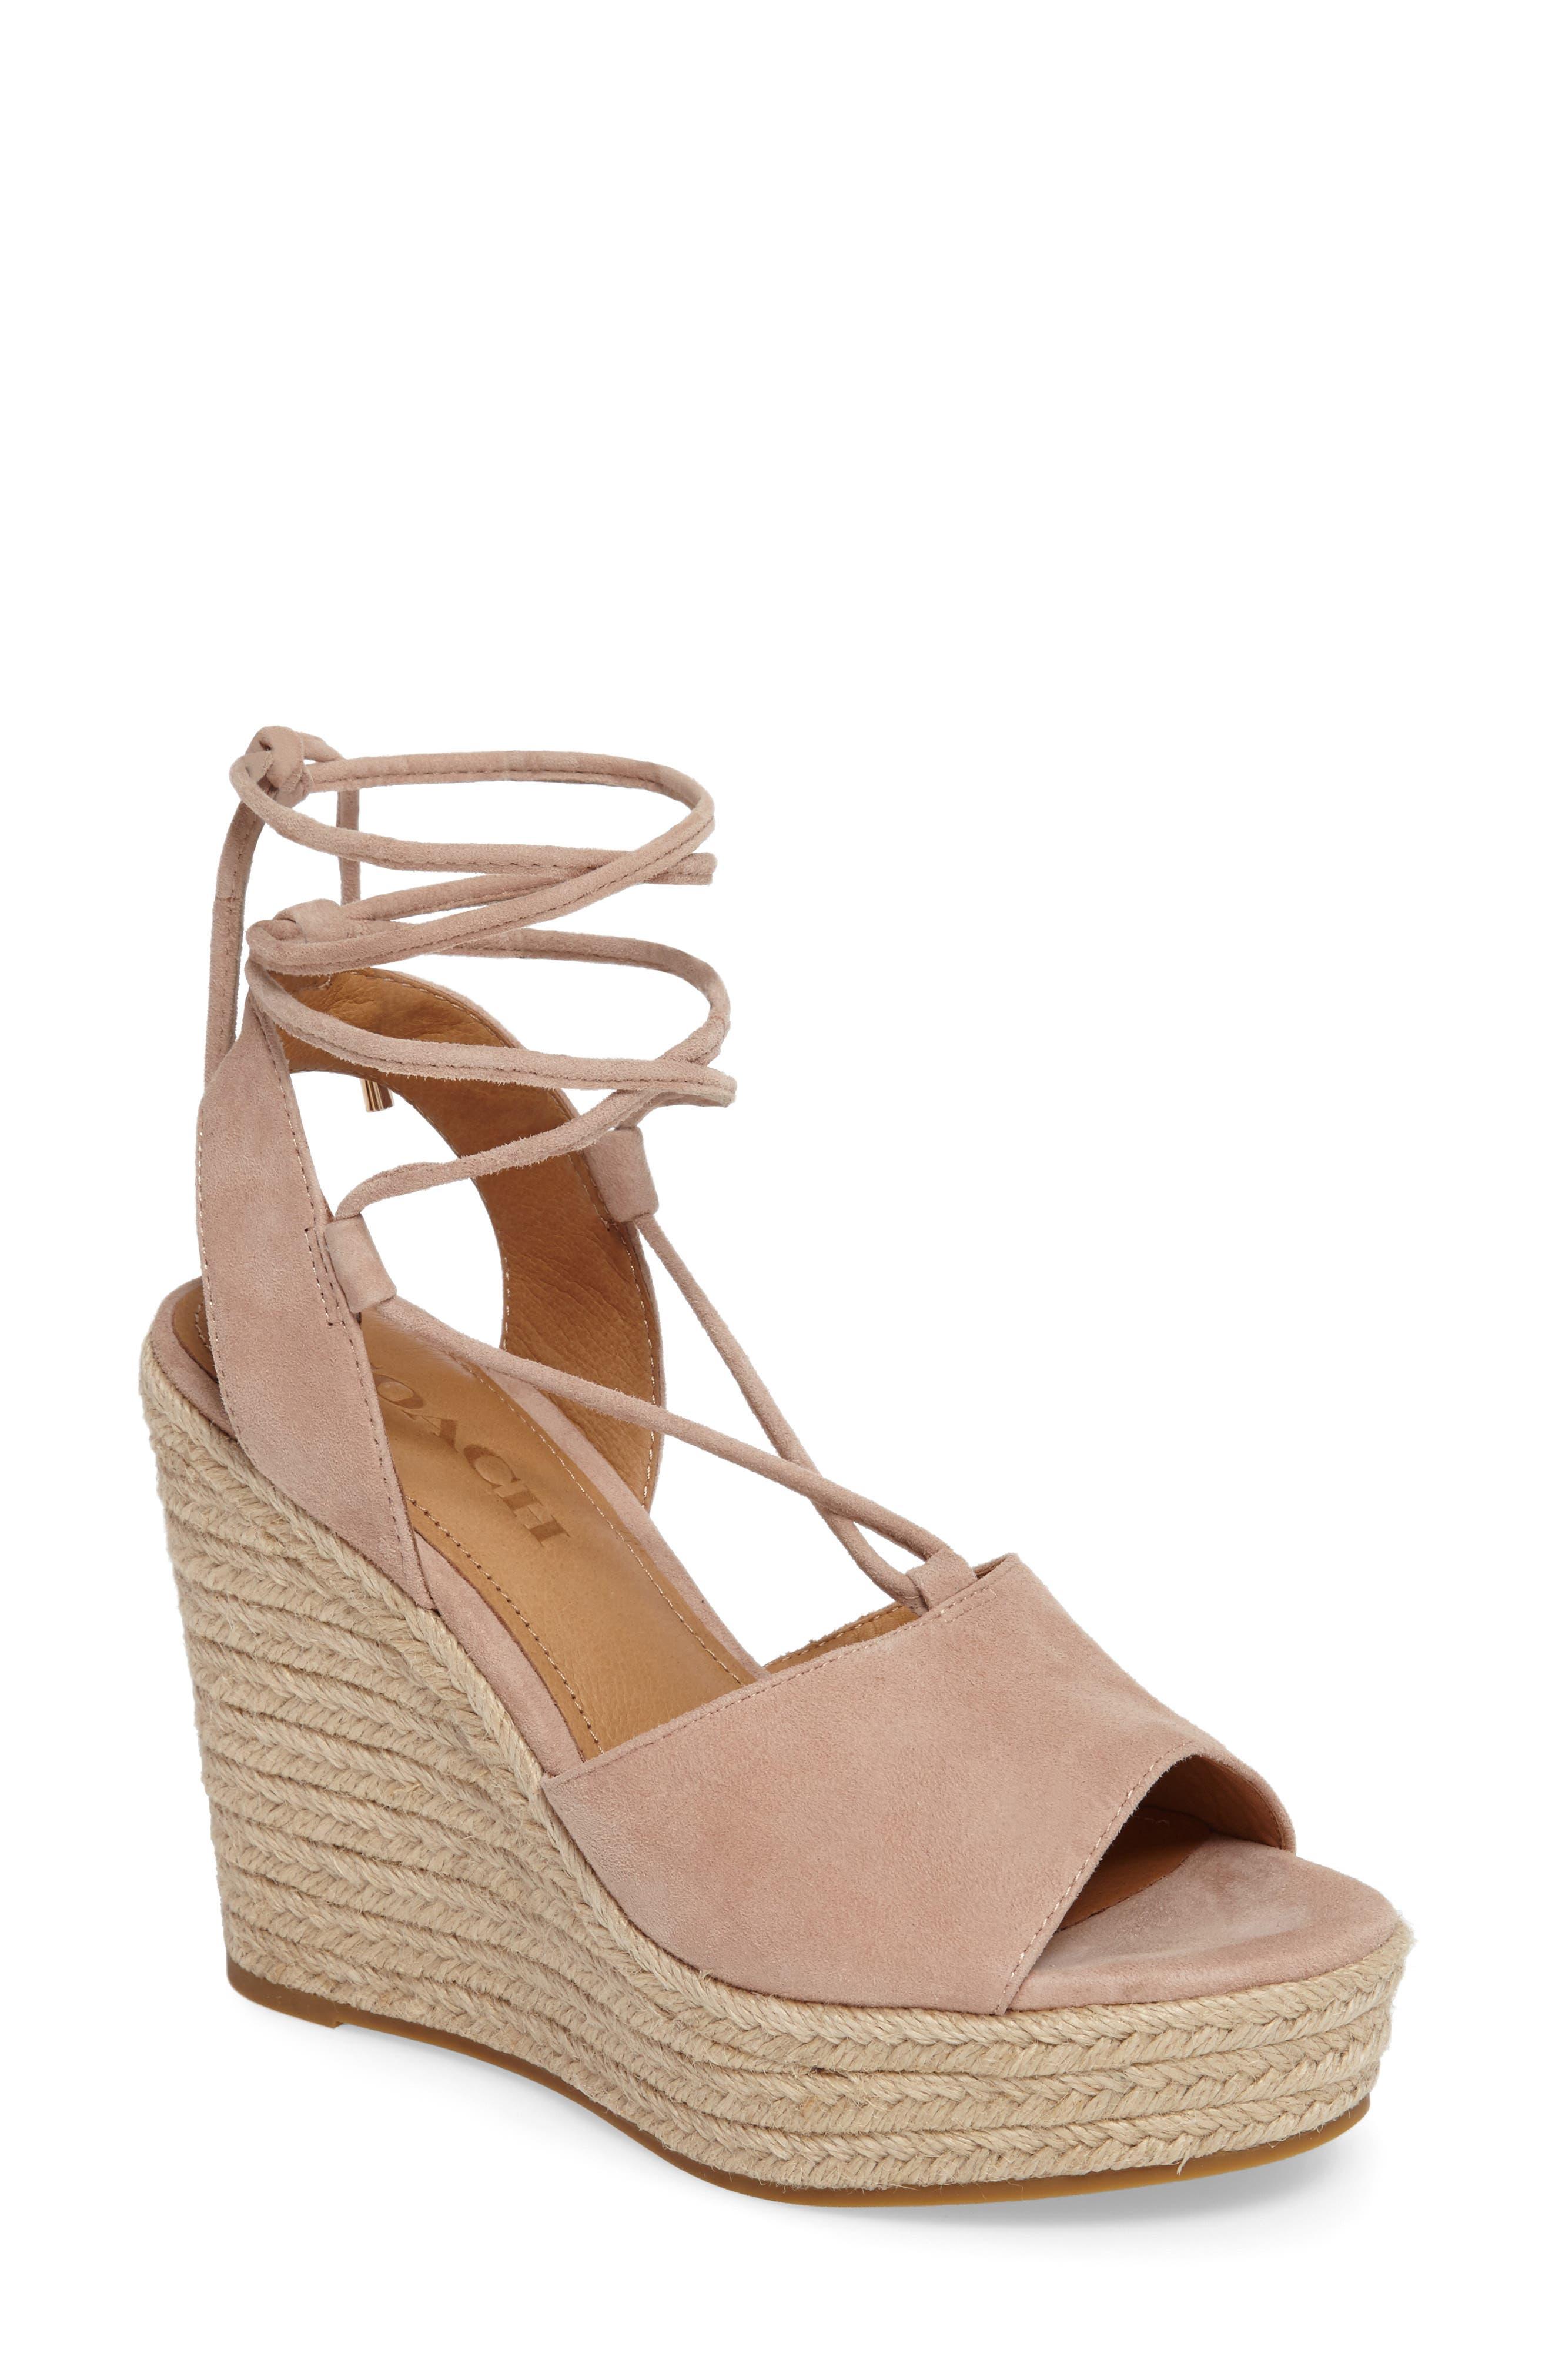 COACH Dana Ankle Wrap Espadrille Sandal (Women)